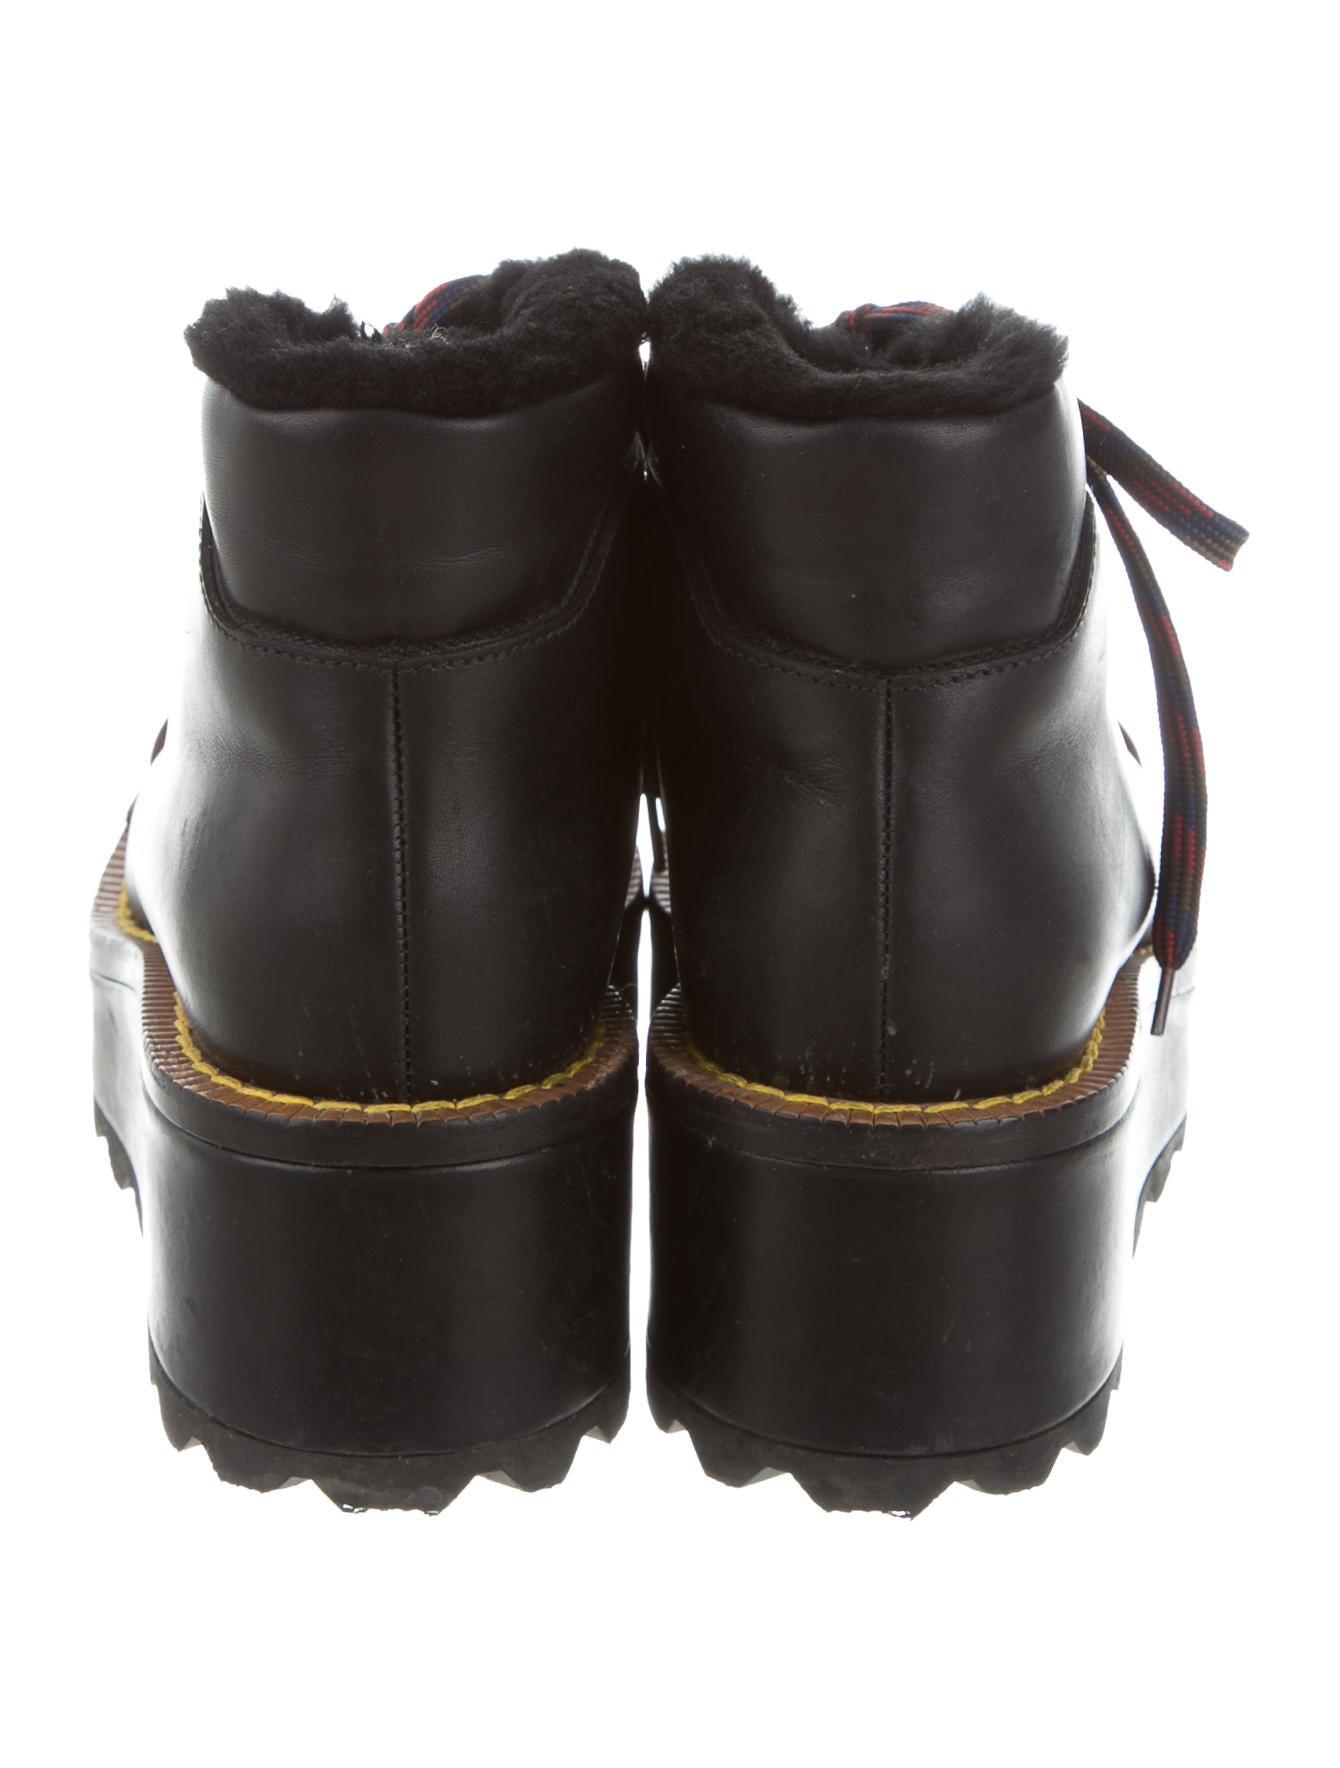 prada 2016 cap toe wedge boots shoes pra149887 the